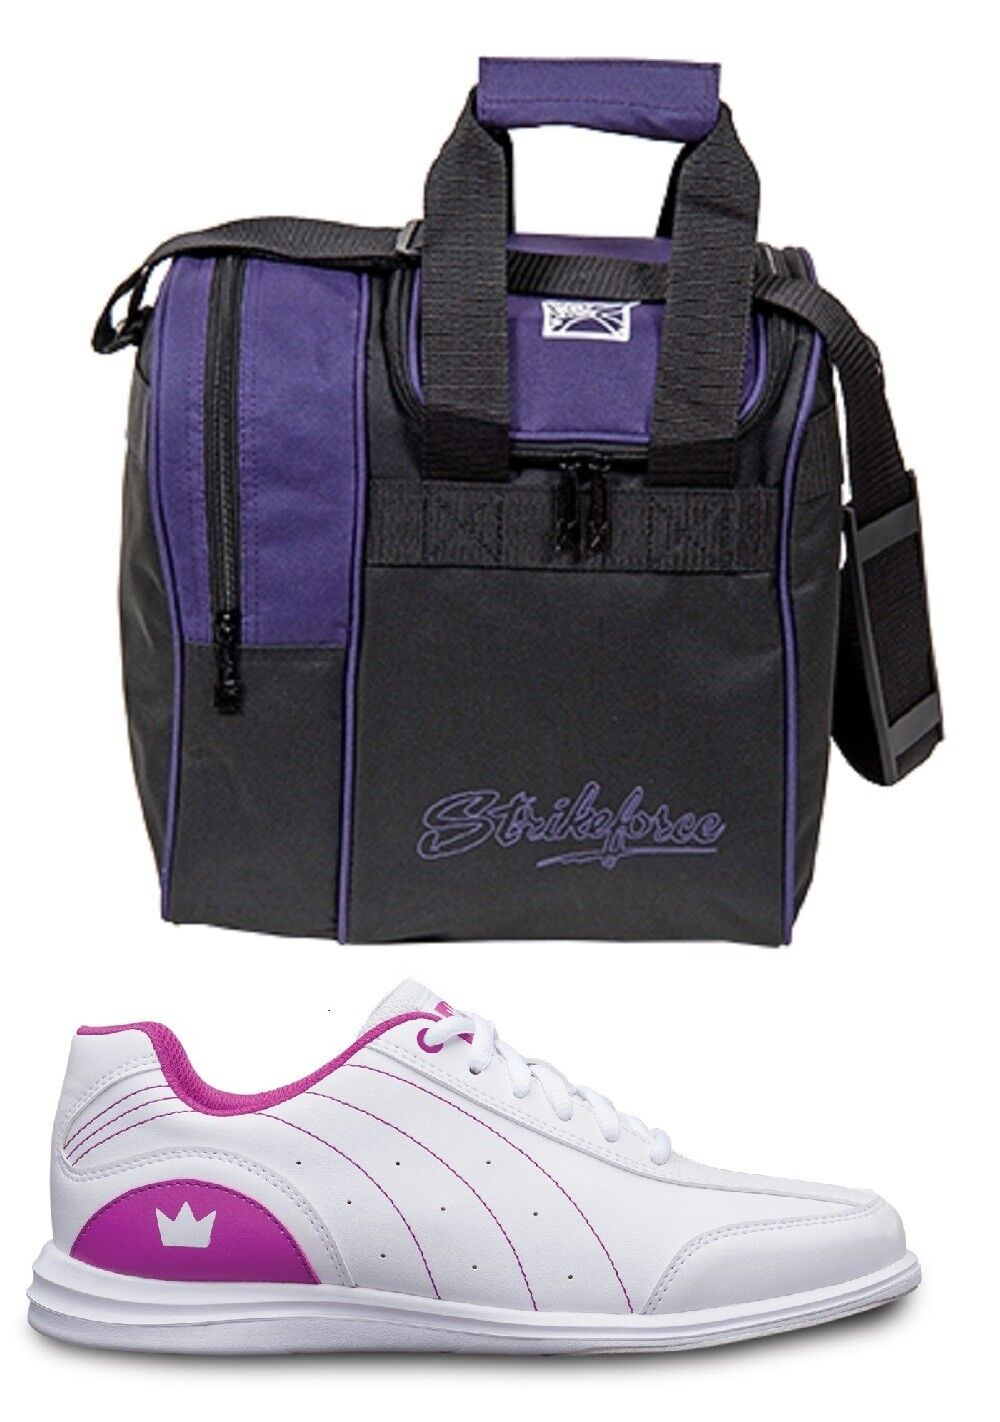 Womens MYSTIC Bowling Ball shoes White Fuchsia Sizes 5-11 & Purple 1 Ball Bag